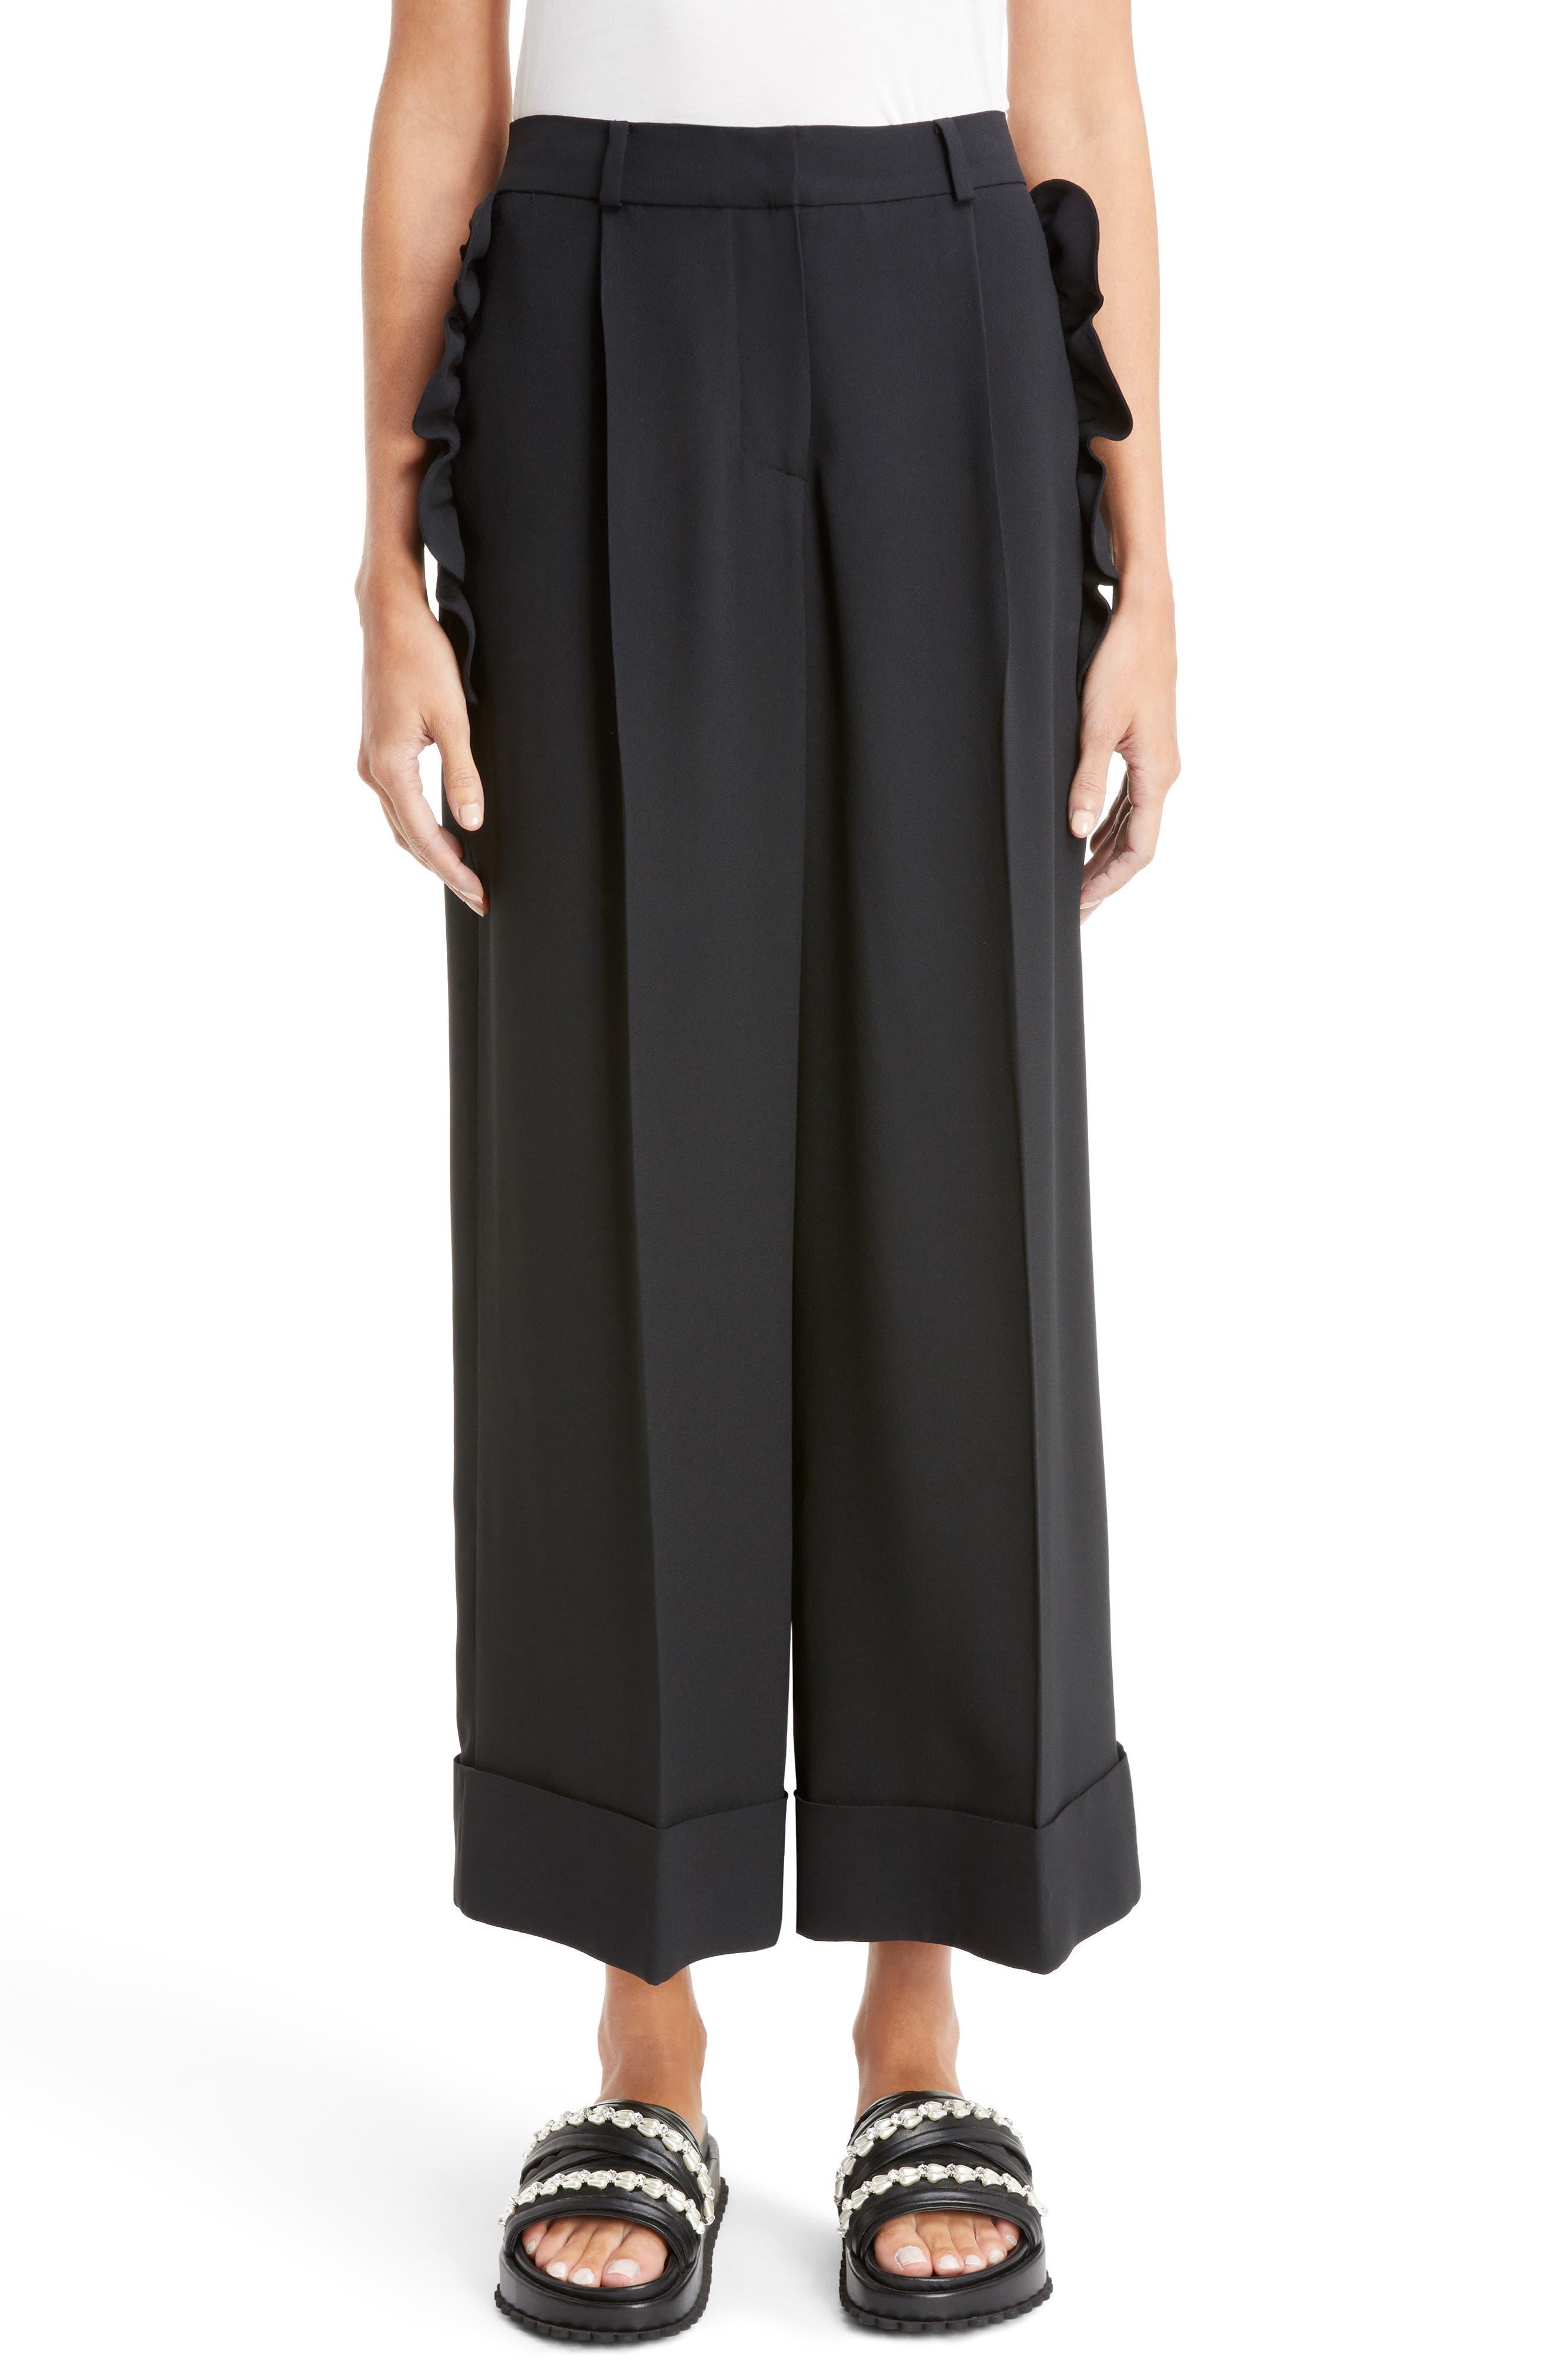 Simone Rocha Ruffle Pocket Wide Leg Crop Pants